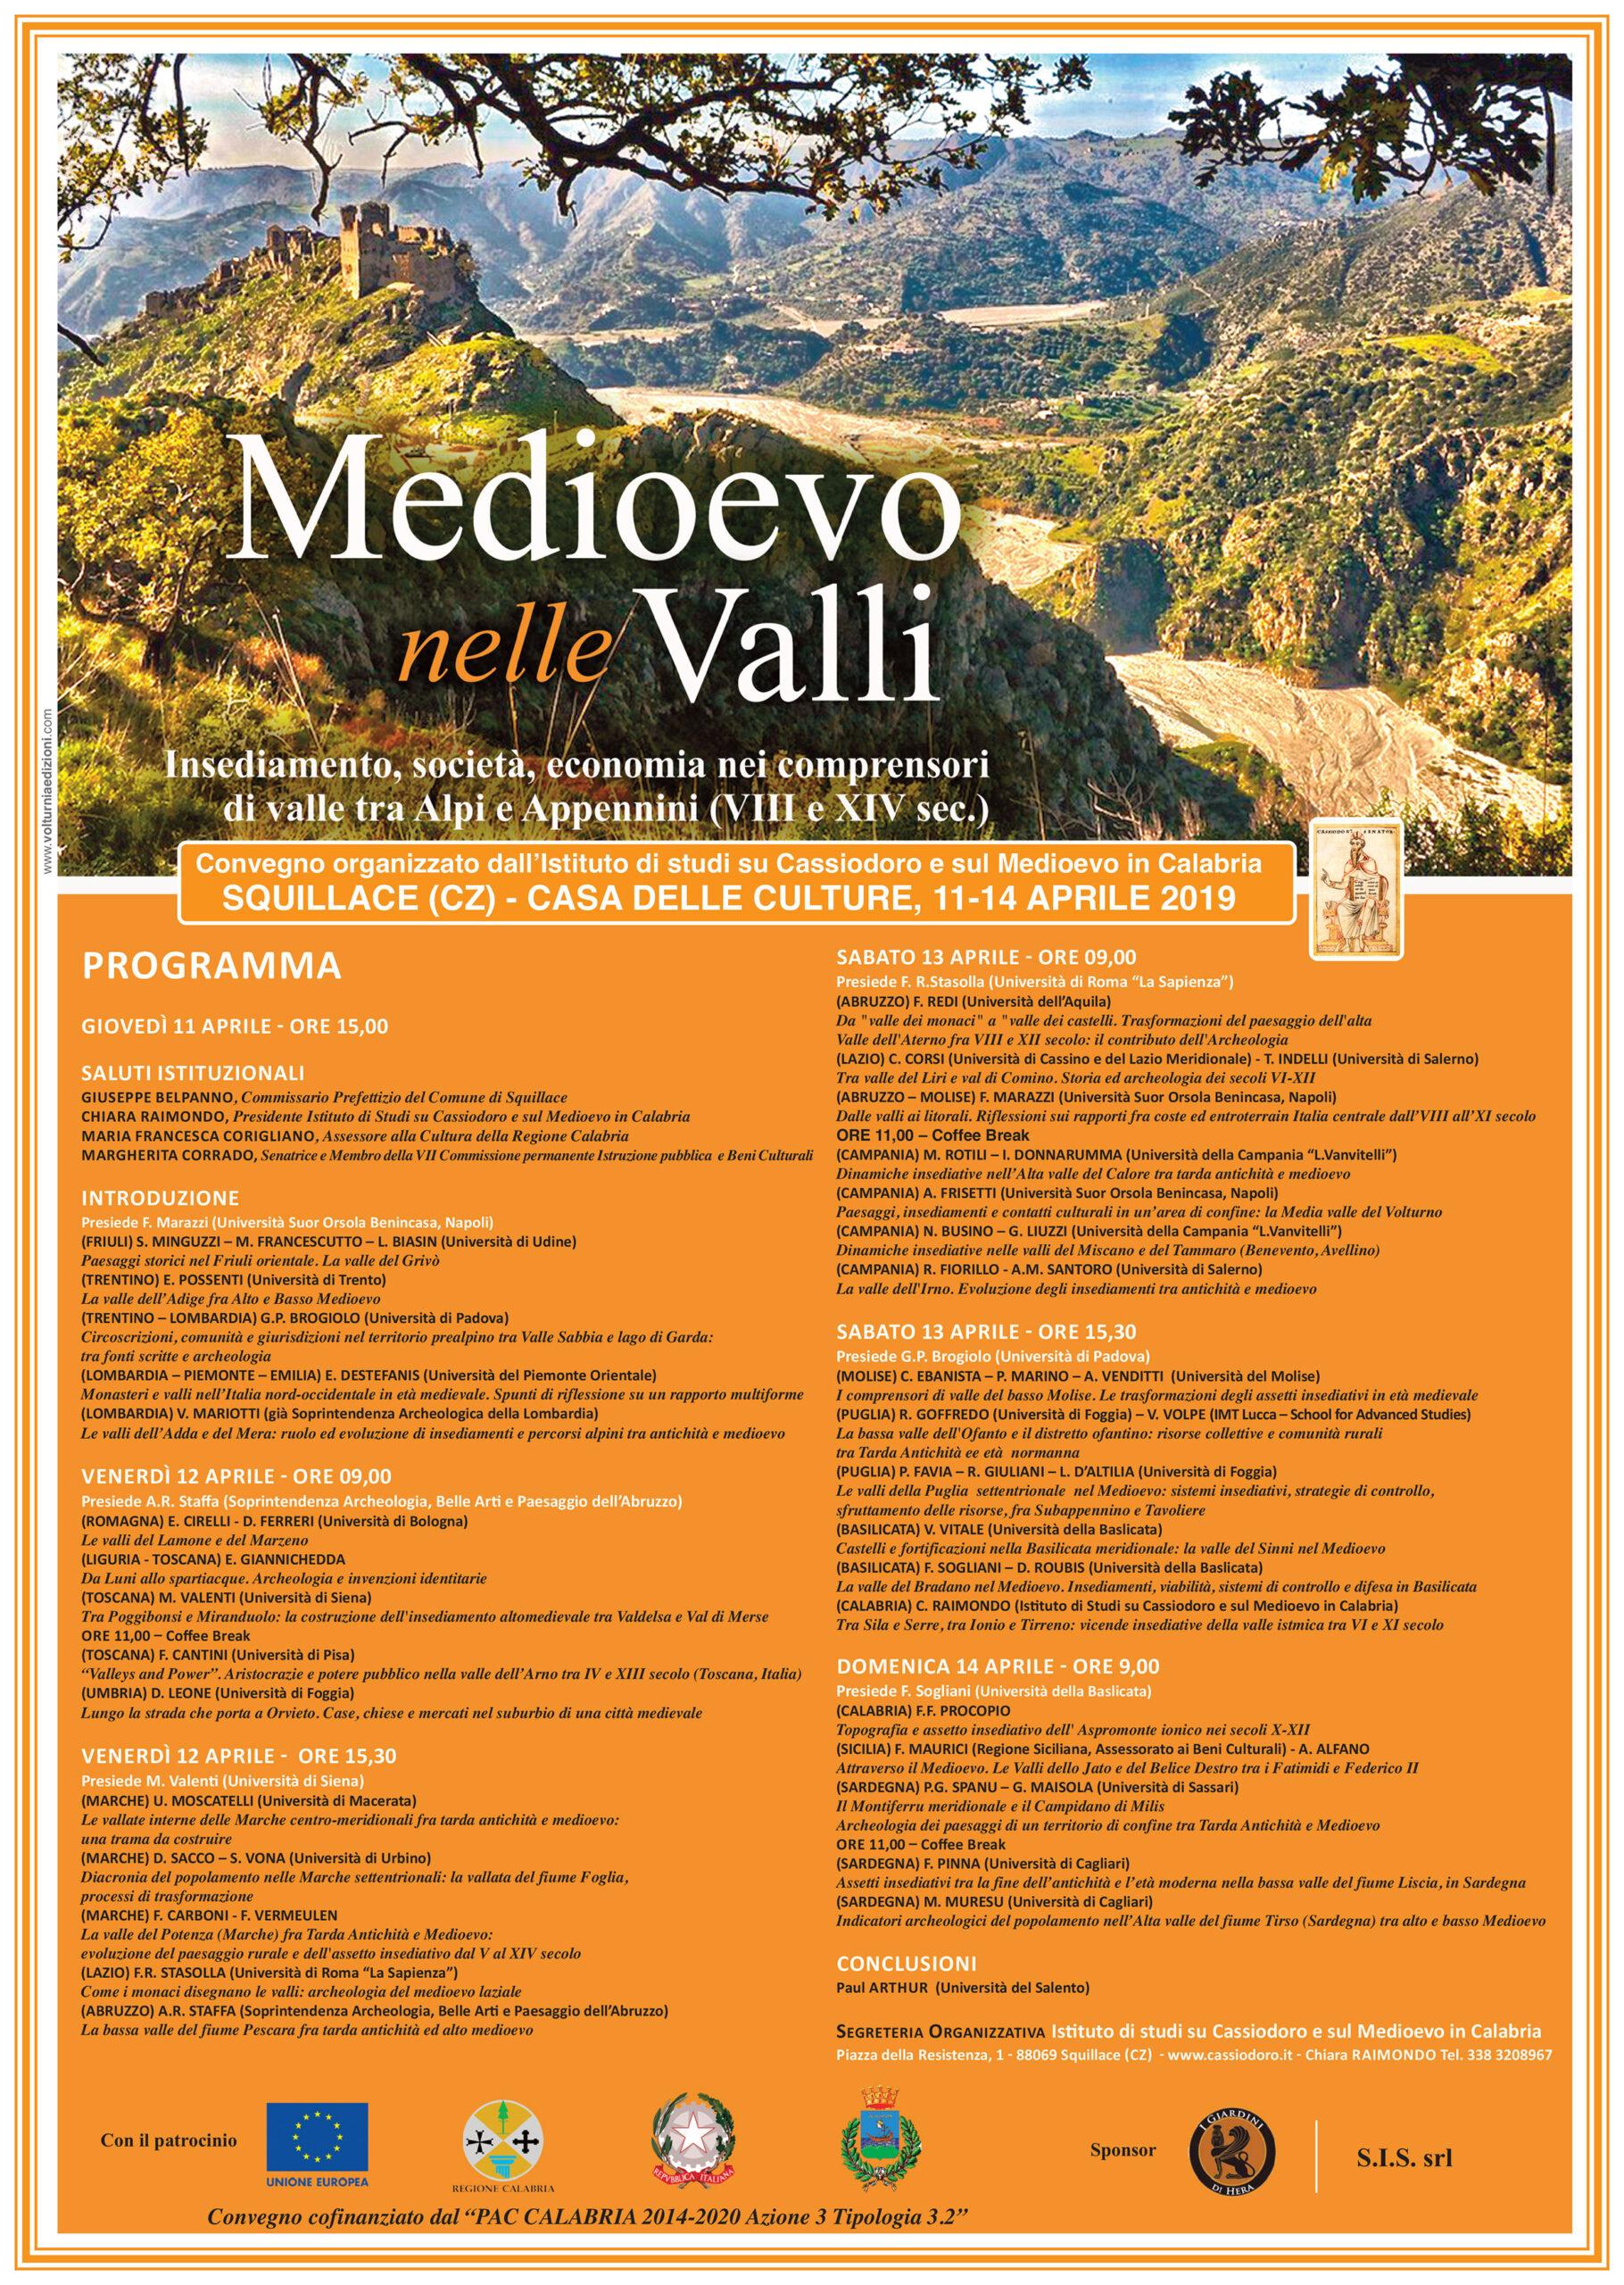 Medioevo nelle valli